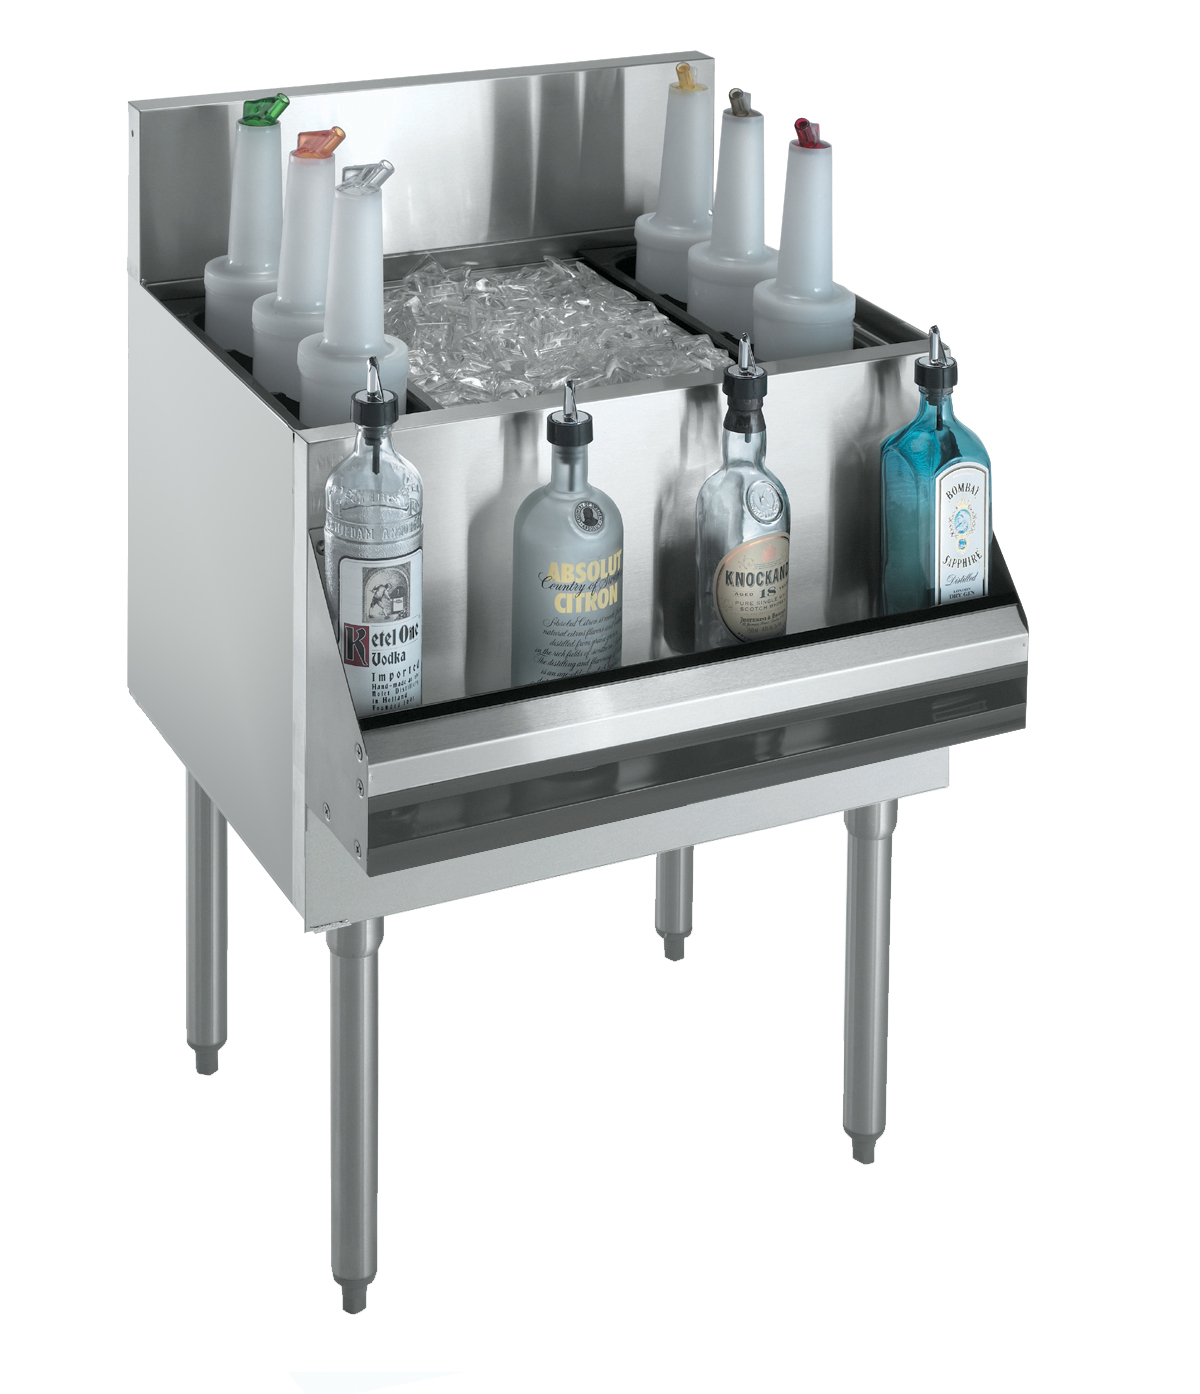 Krowne Metal KR18-48 underbar ice bin/cocktail unit